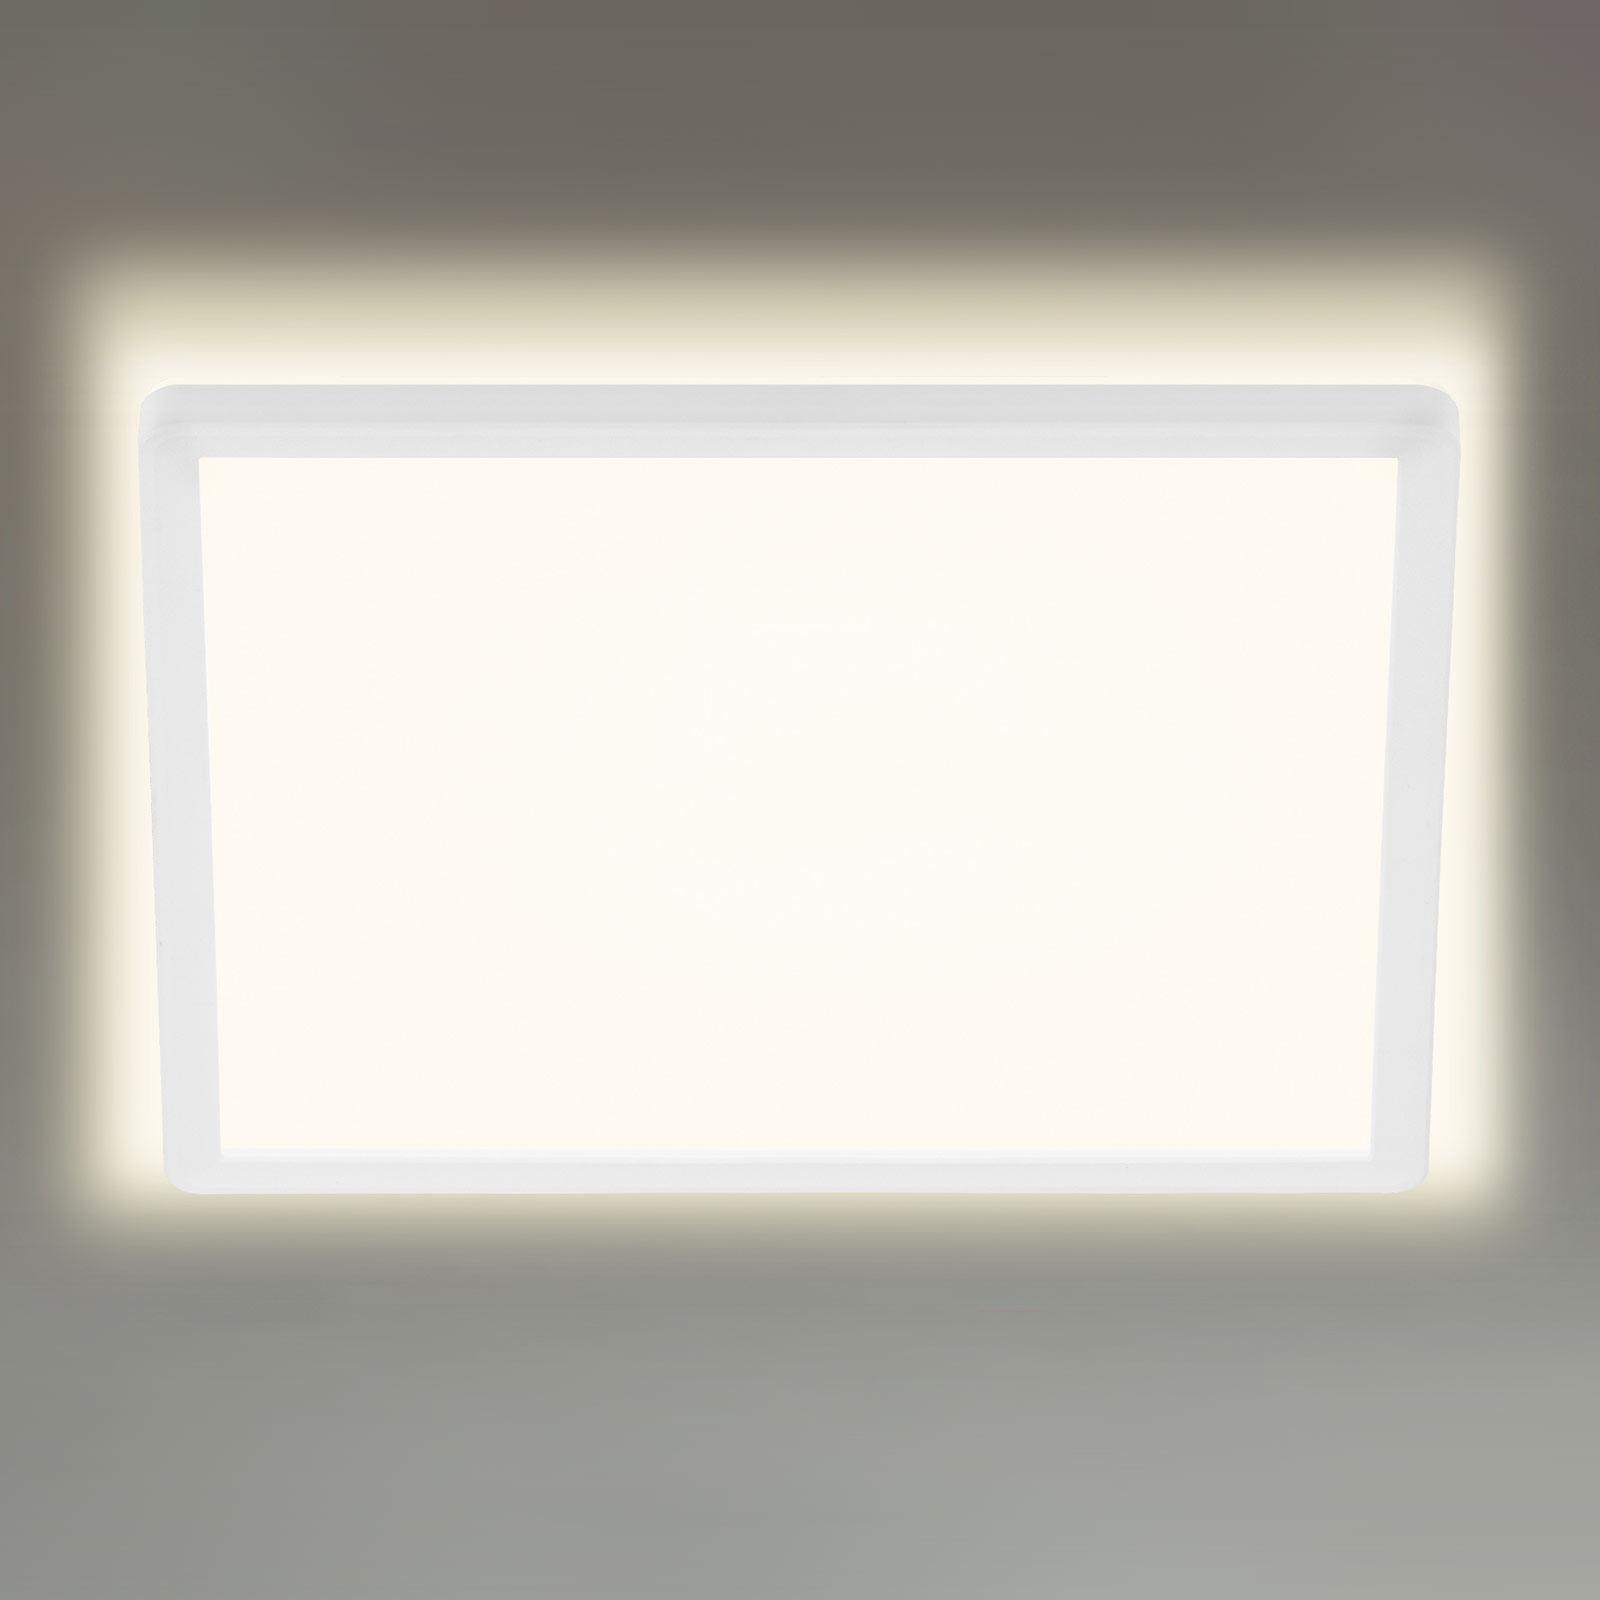 Lampa sufitowa LED 7156/7158 LED kątowa 29,3x29,3